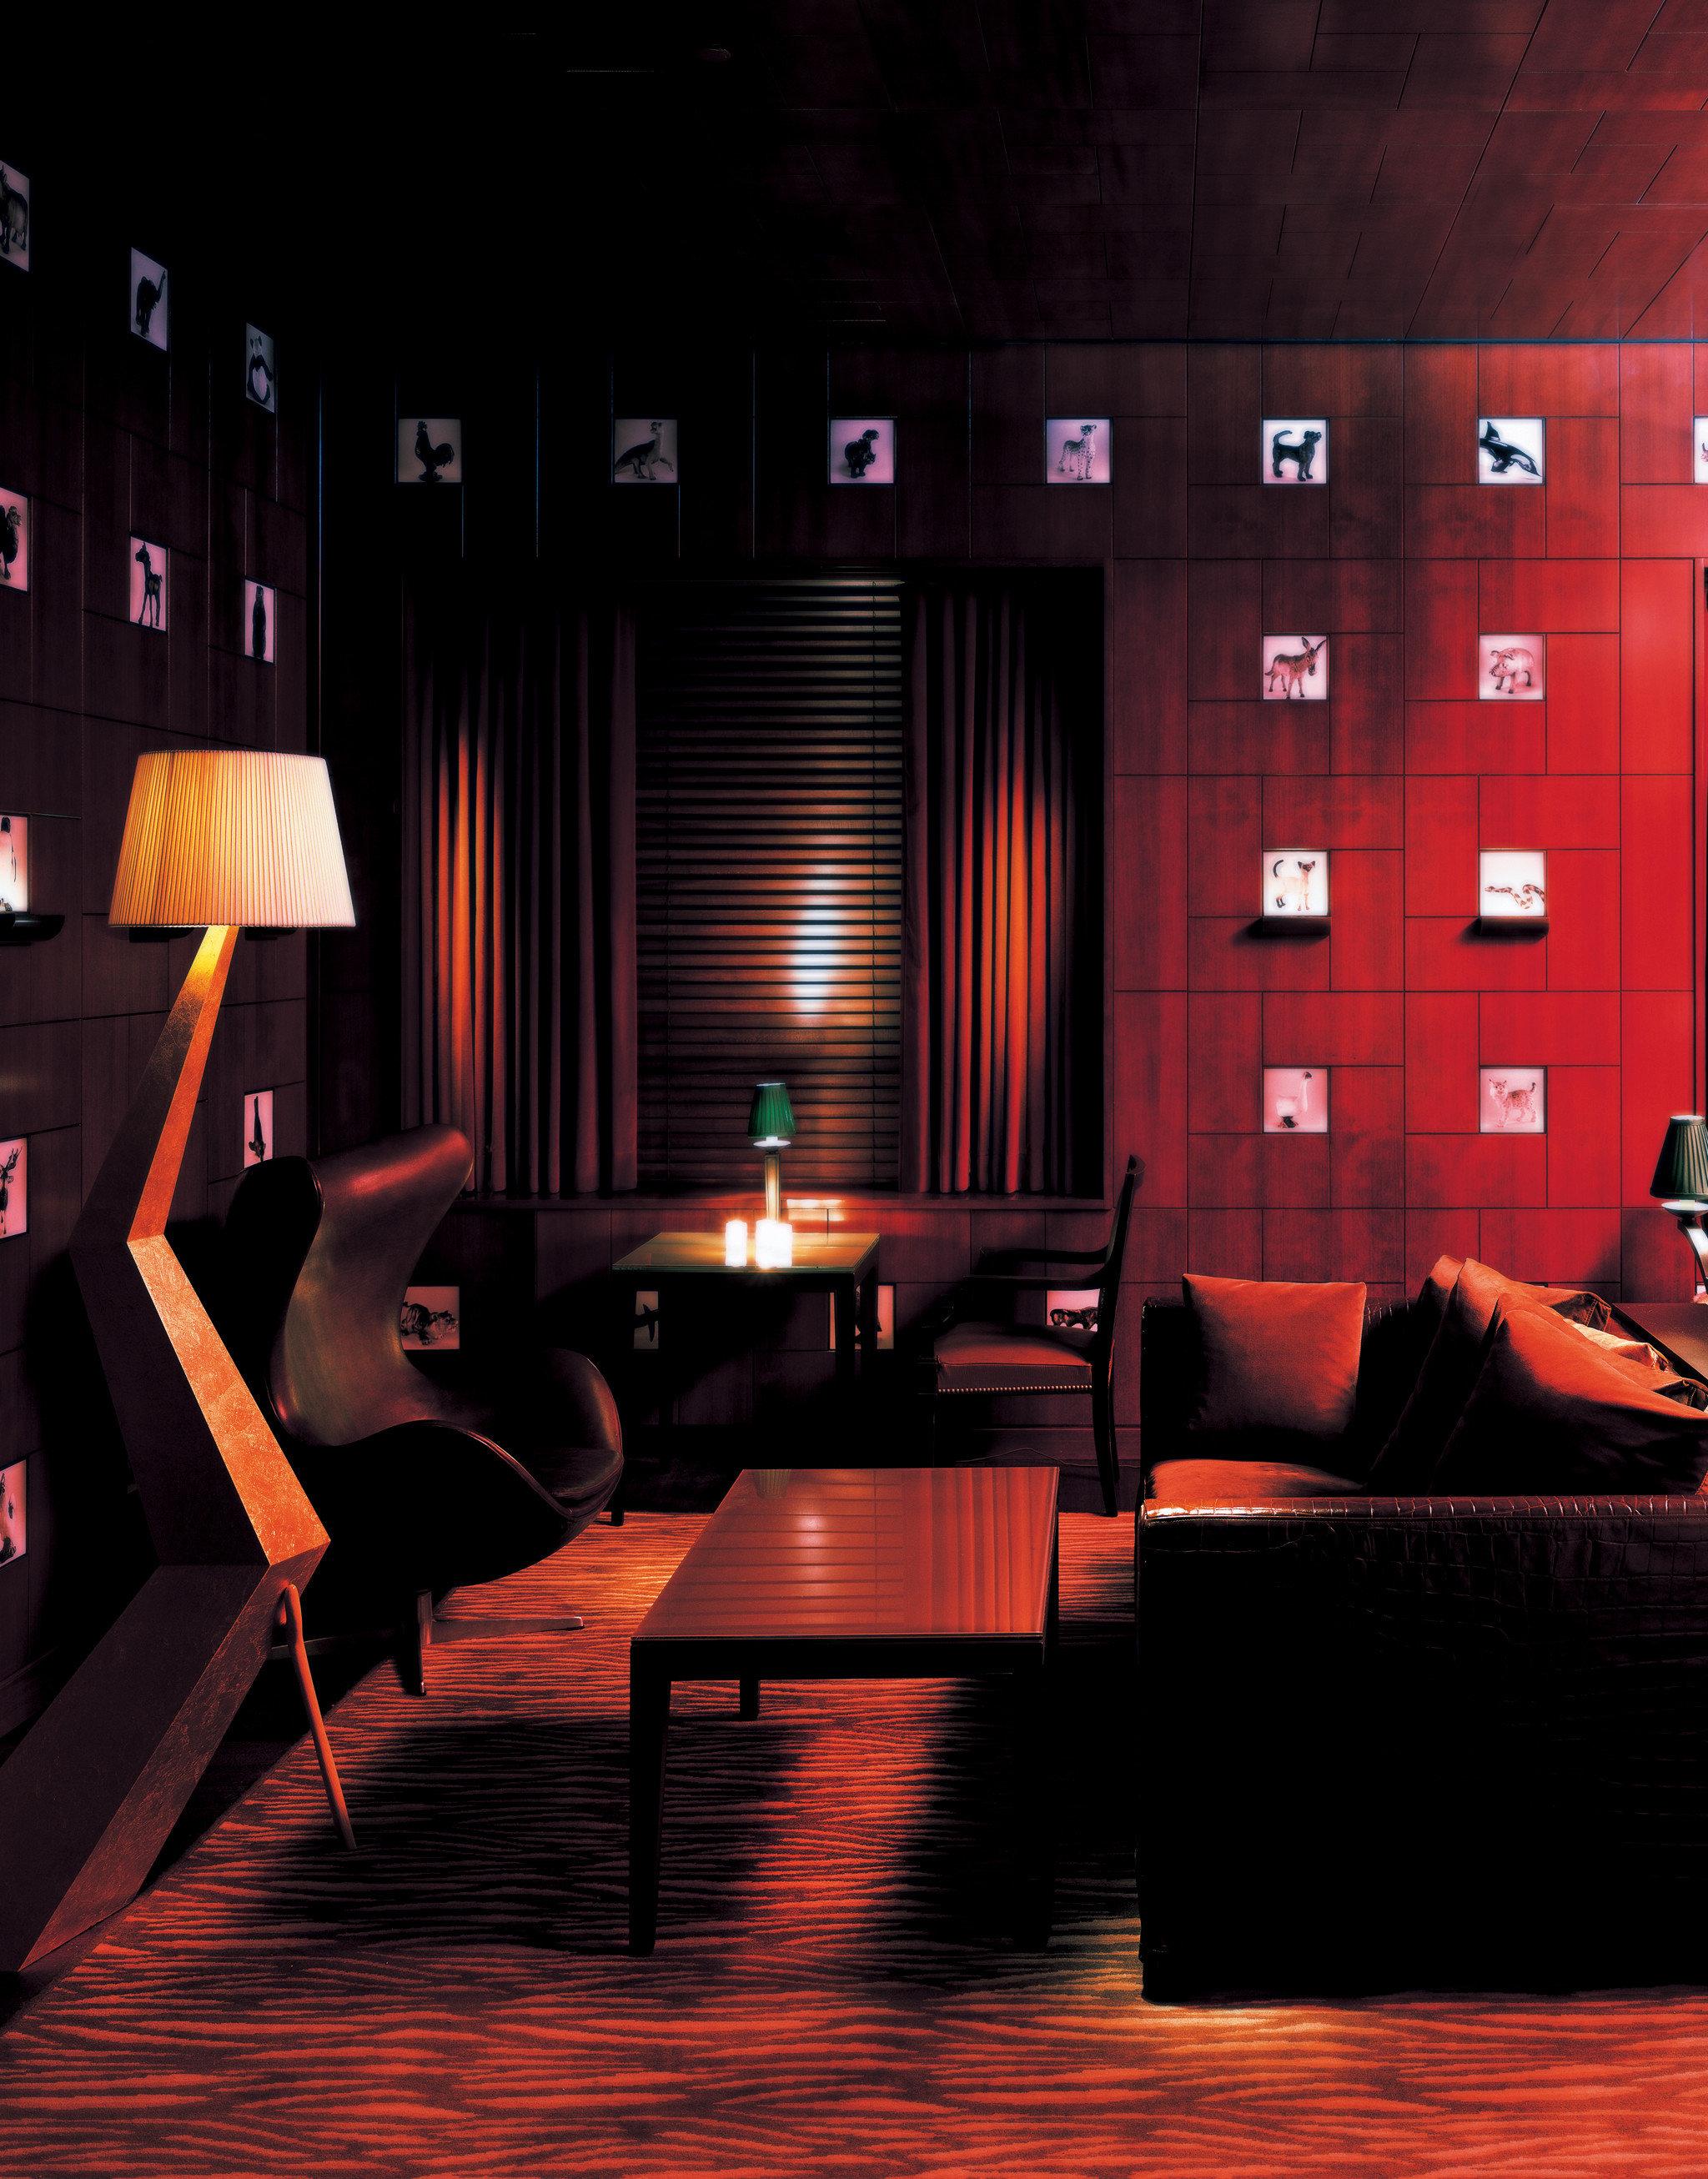 City Drink Hip Historic Lounge red stage Bar shape auditorium nightclub movie theater theatre